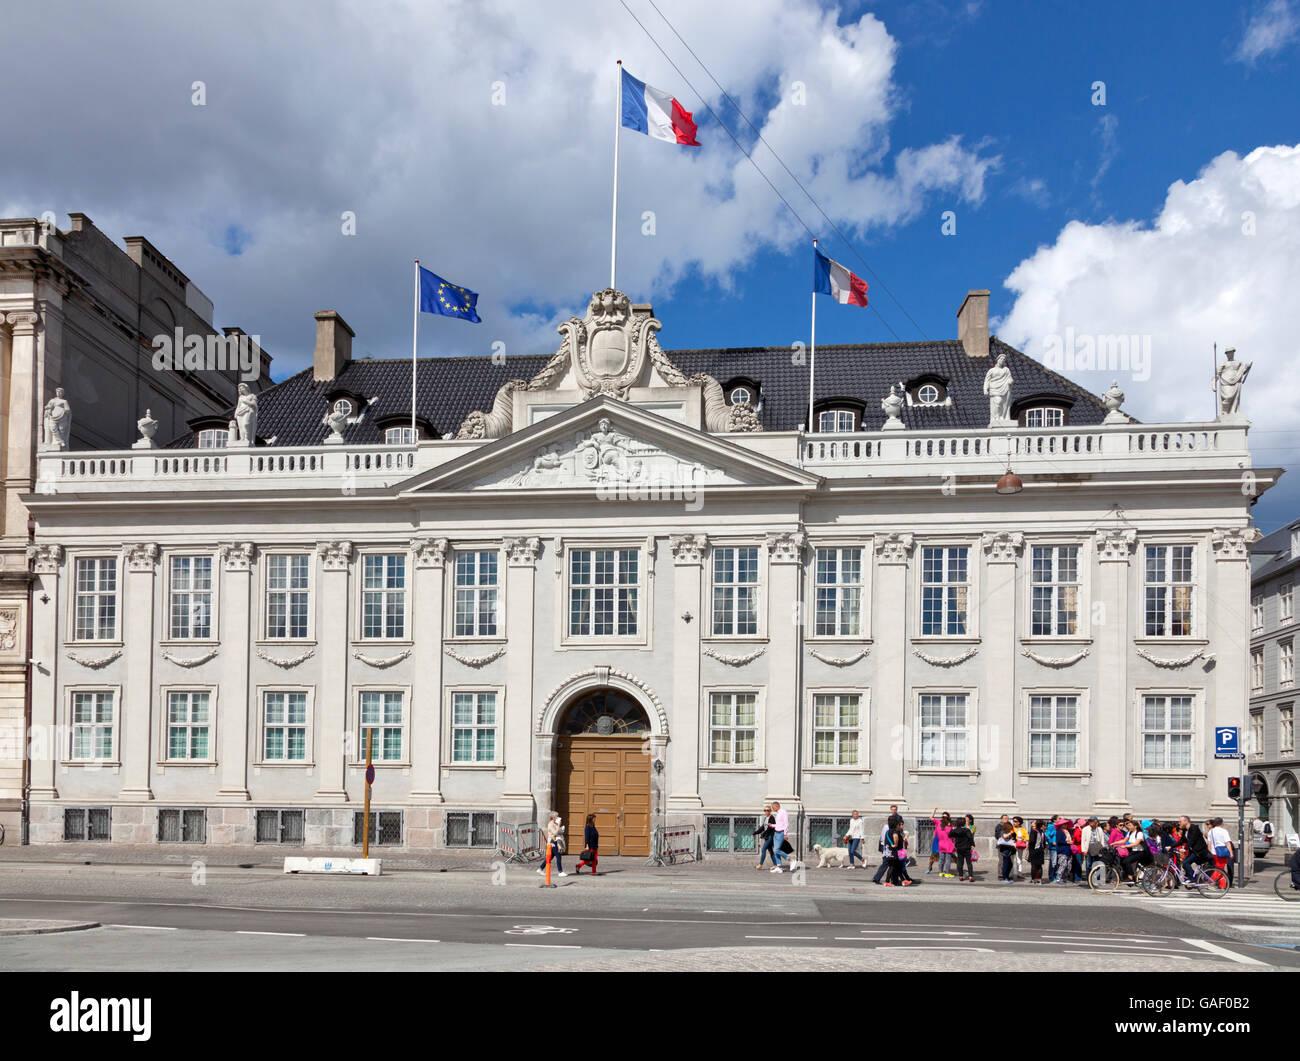 The French embassy at Kongens Nytorv in Copenhagen in the Thottske Palæ (the Thott Mansion) - Stock Image